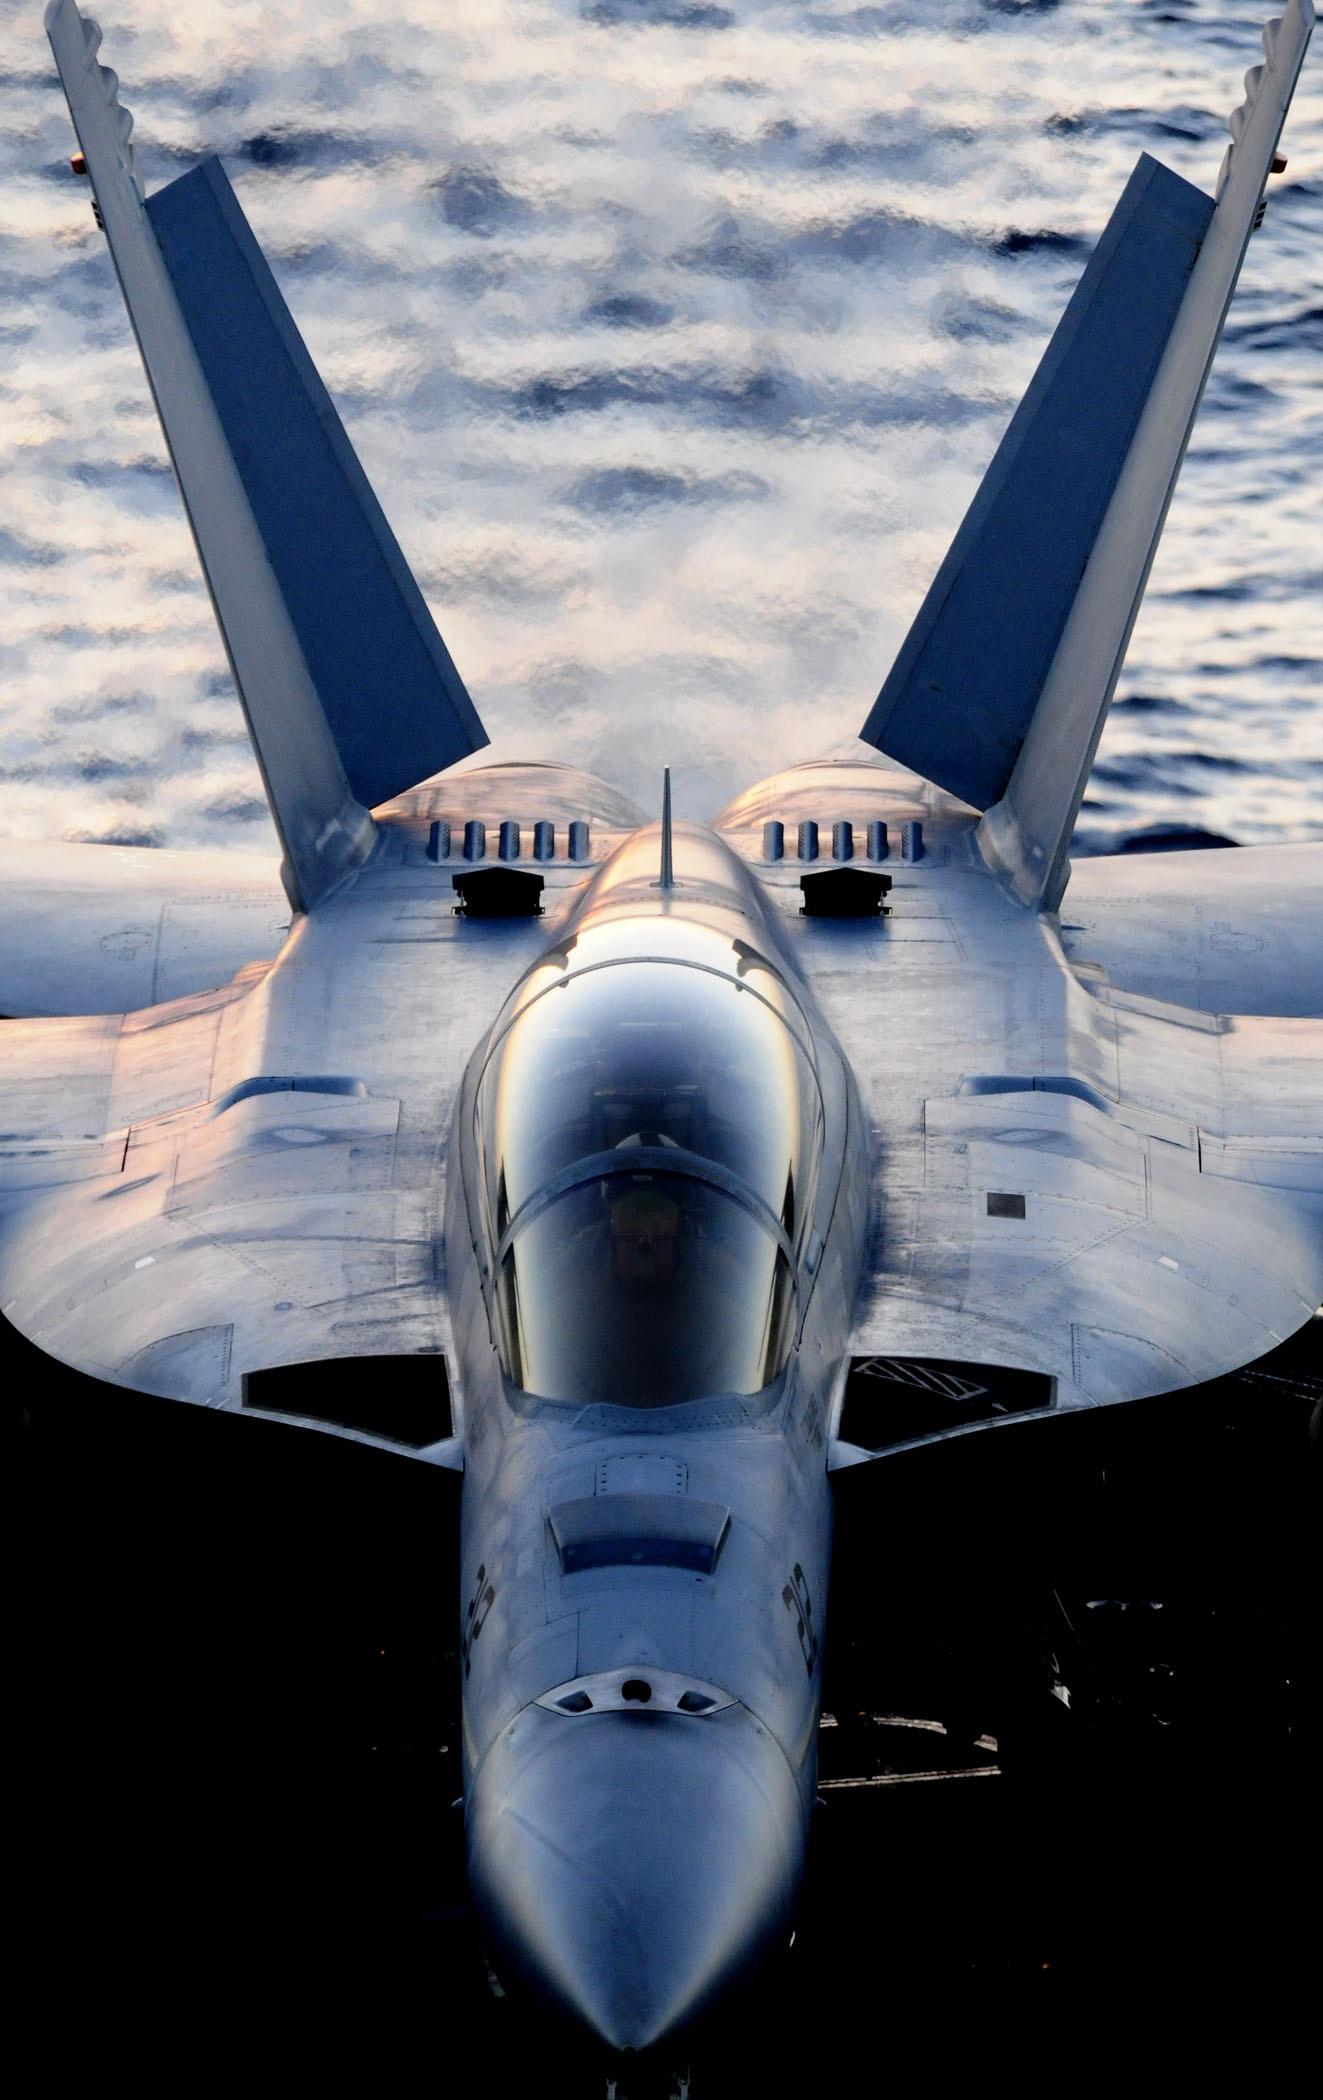 Military jet photo